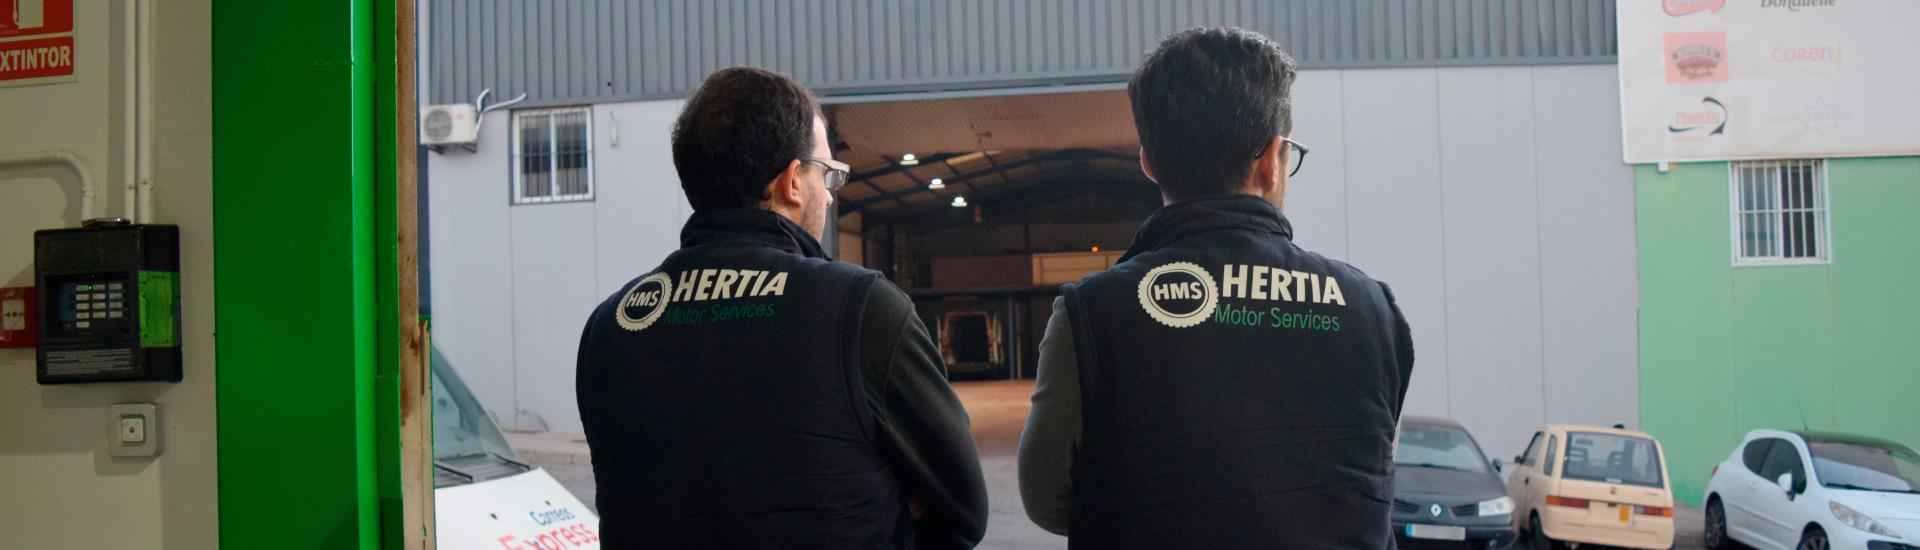 Hertia Motor Services